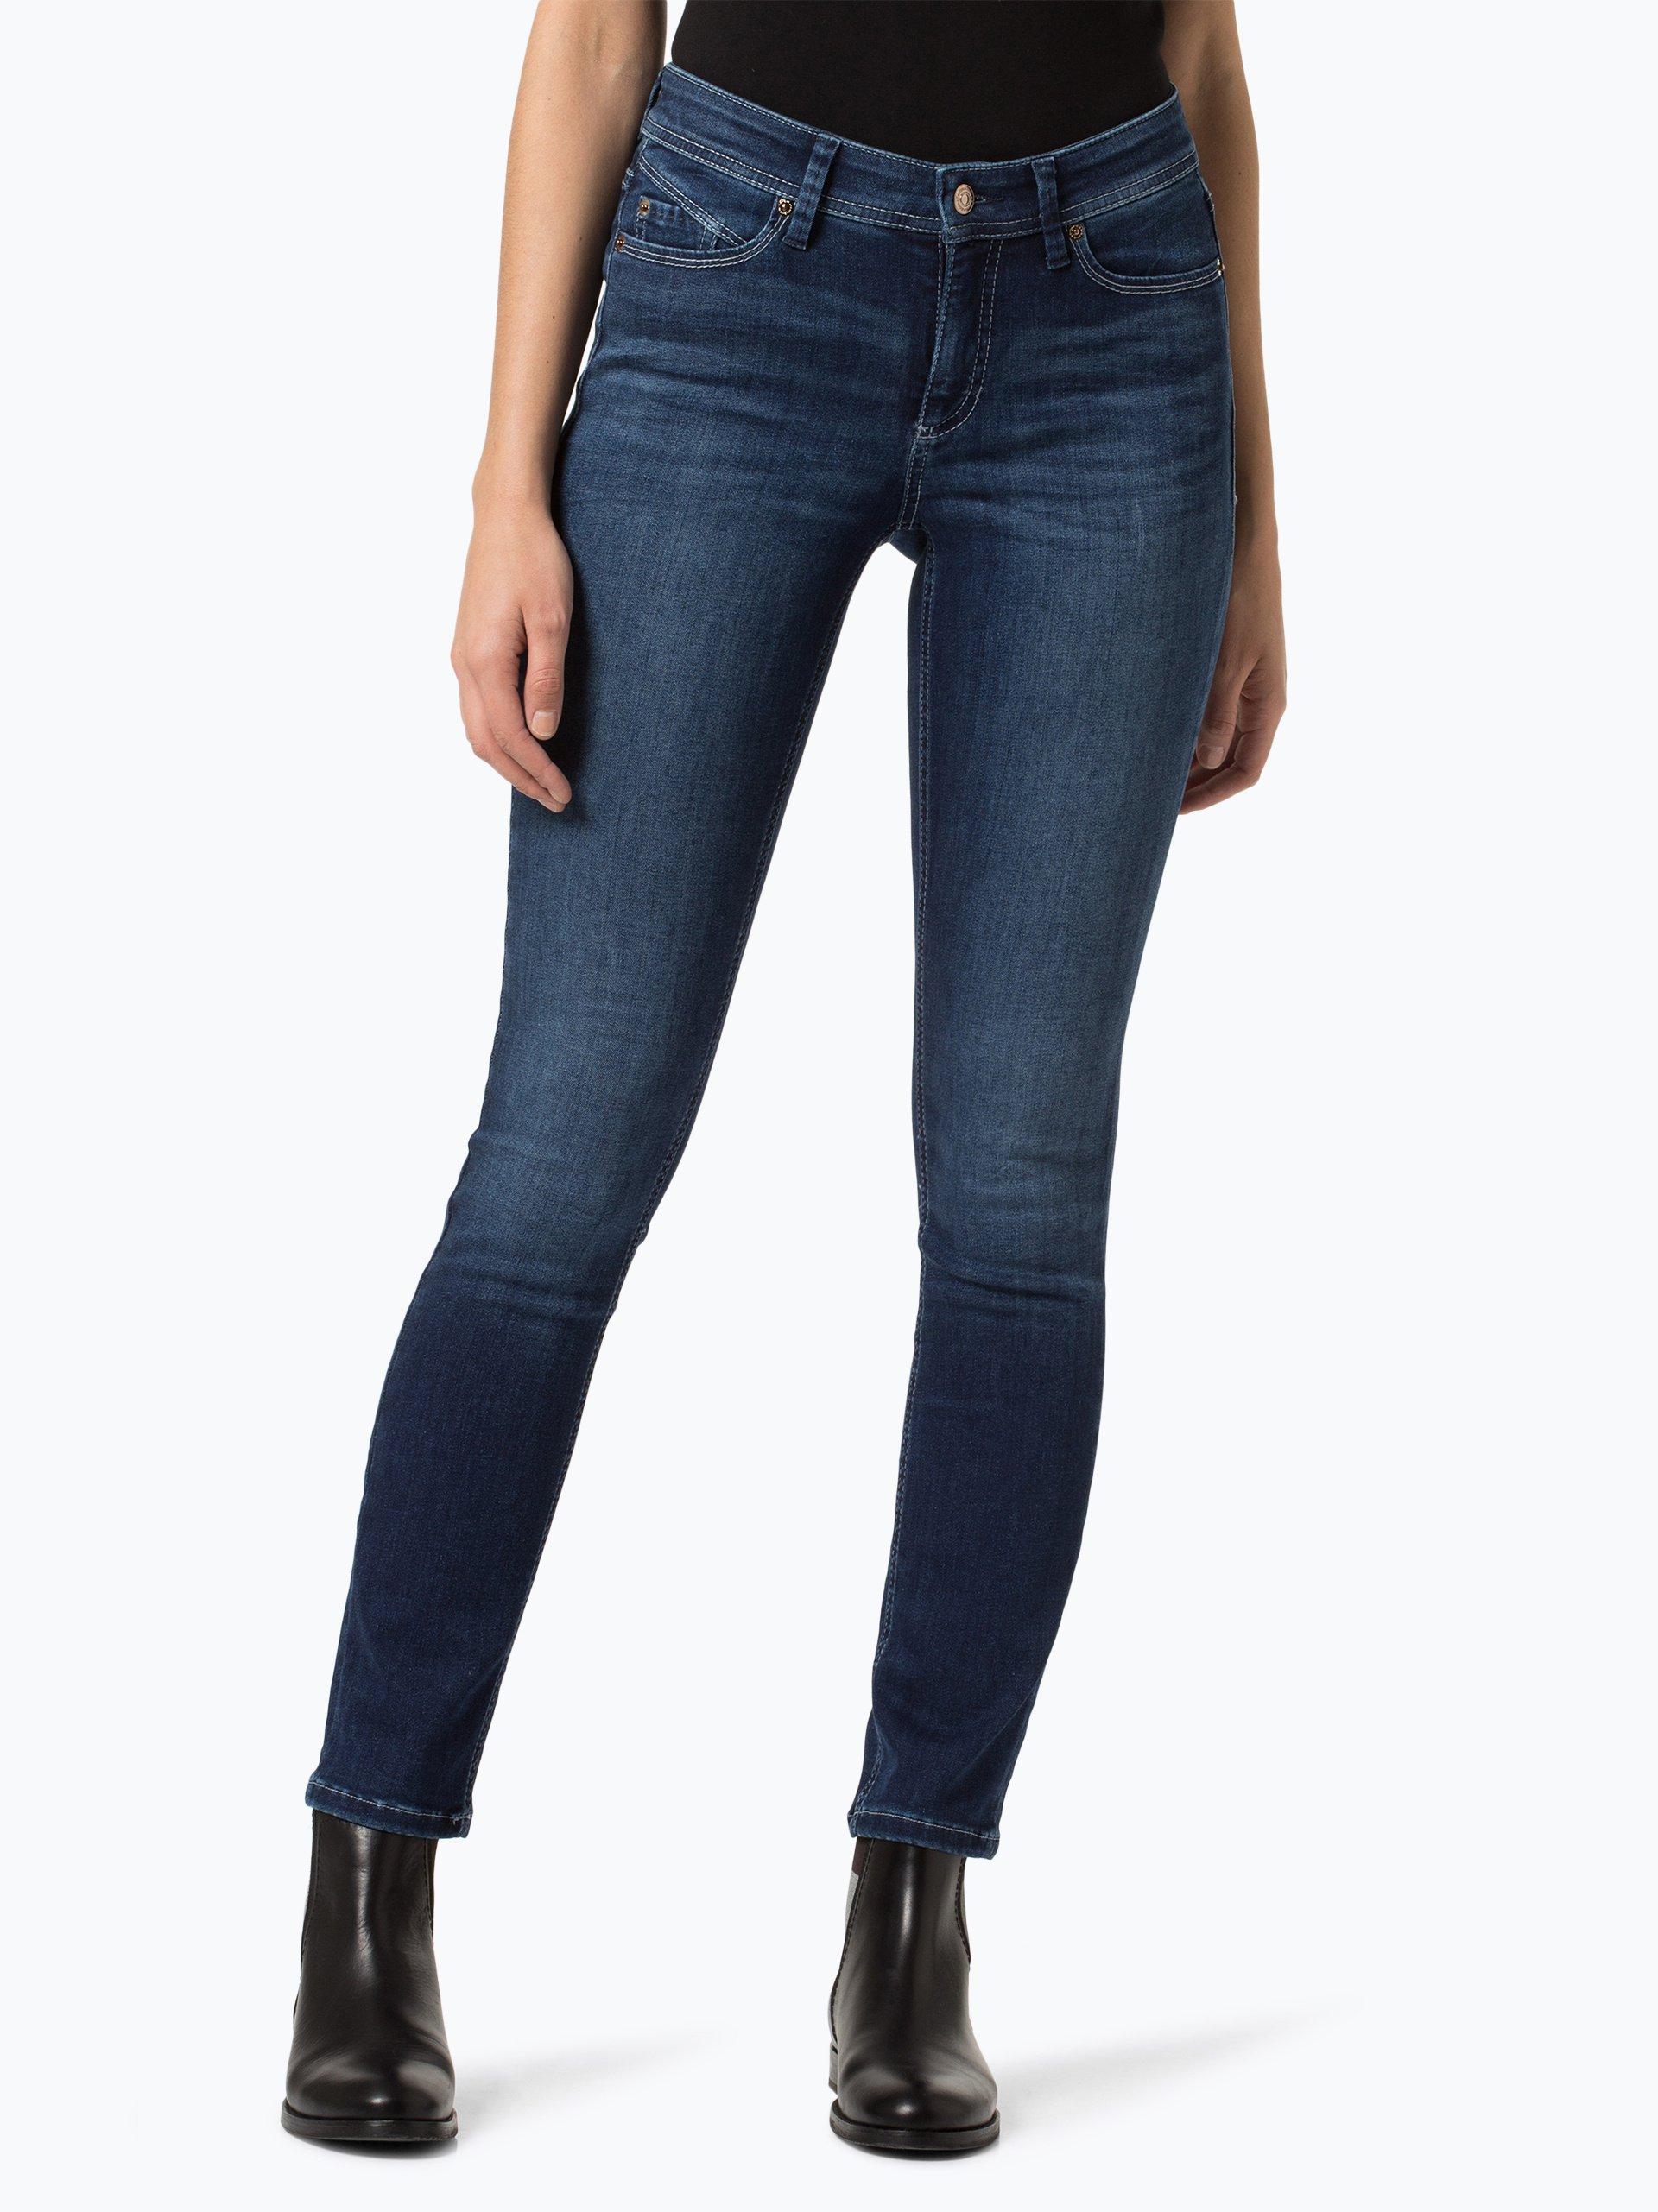 cambio damen jeans parla blue stone uni online kaufen. Black Bedroom Furniture Sets. Home Design Ideas